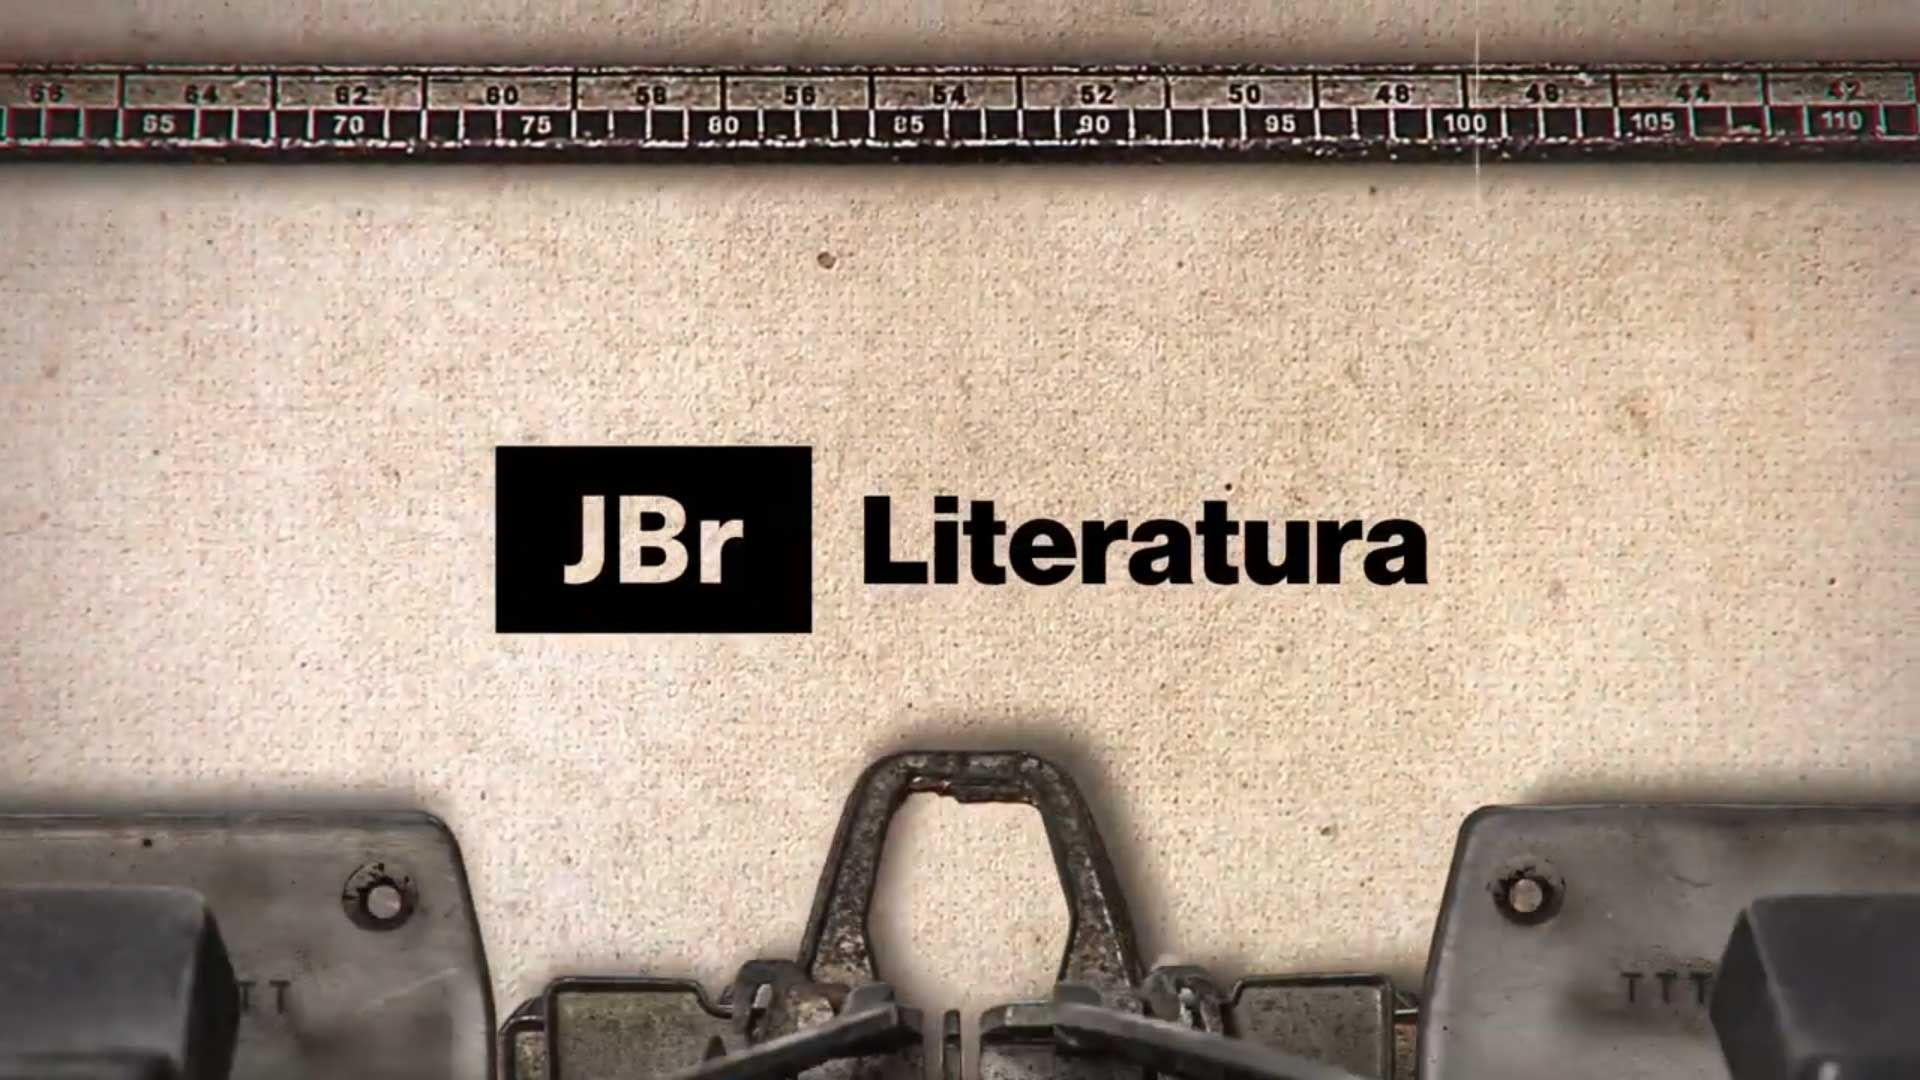 JBr Literatura